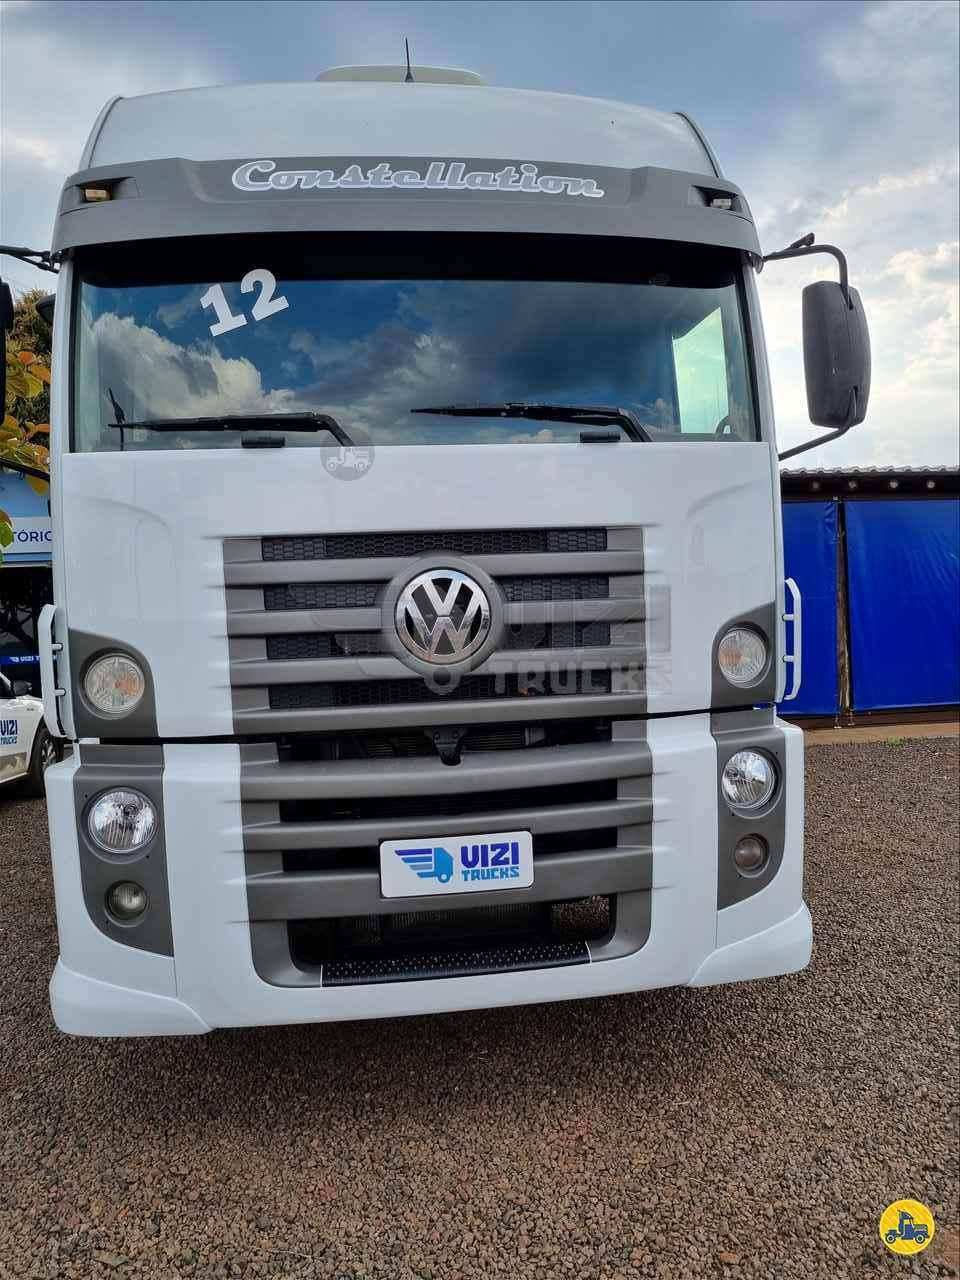 CAMINHAO VOLKSWAGEN VW 25390 Cavalo Mecânico Truck 6x2 Vizi Trucks DOIS VIZINHOS PARANÁ PR